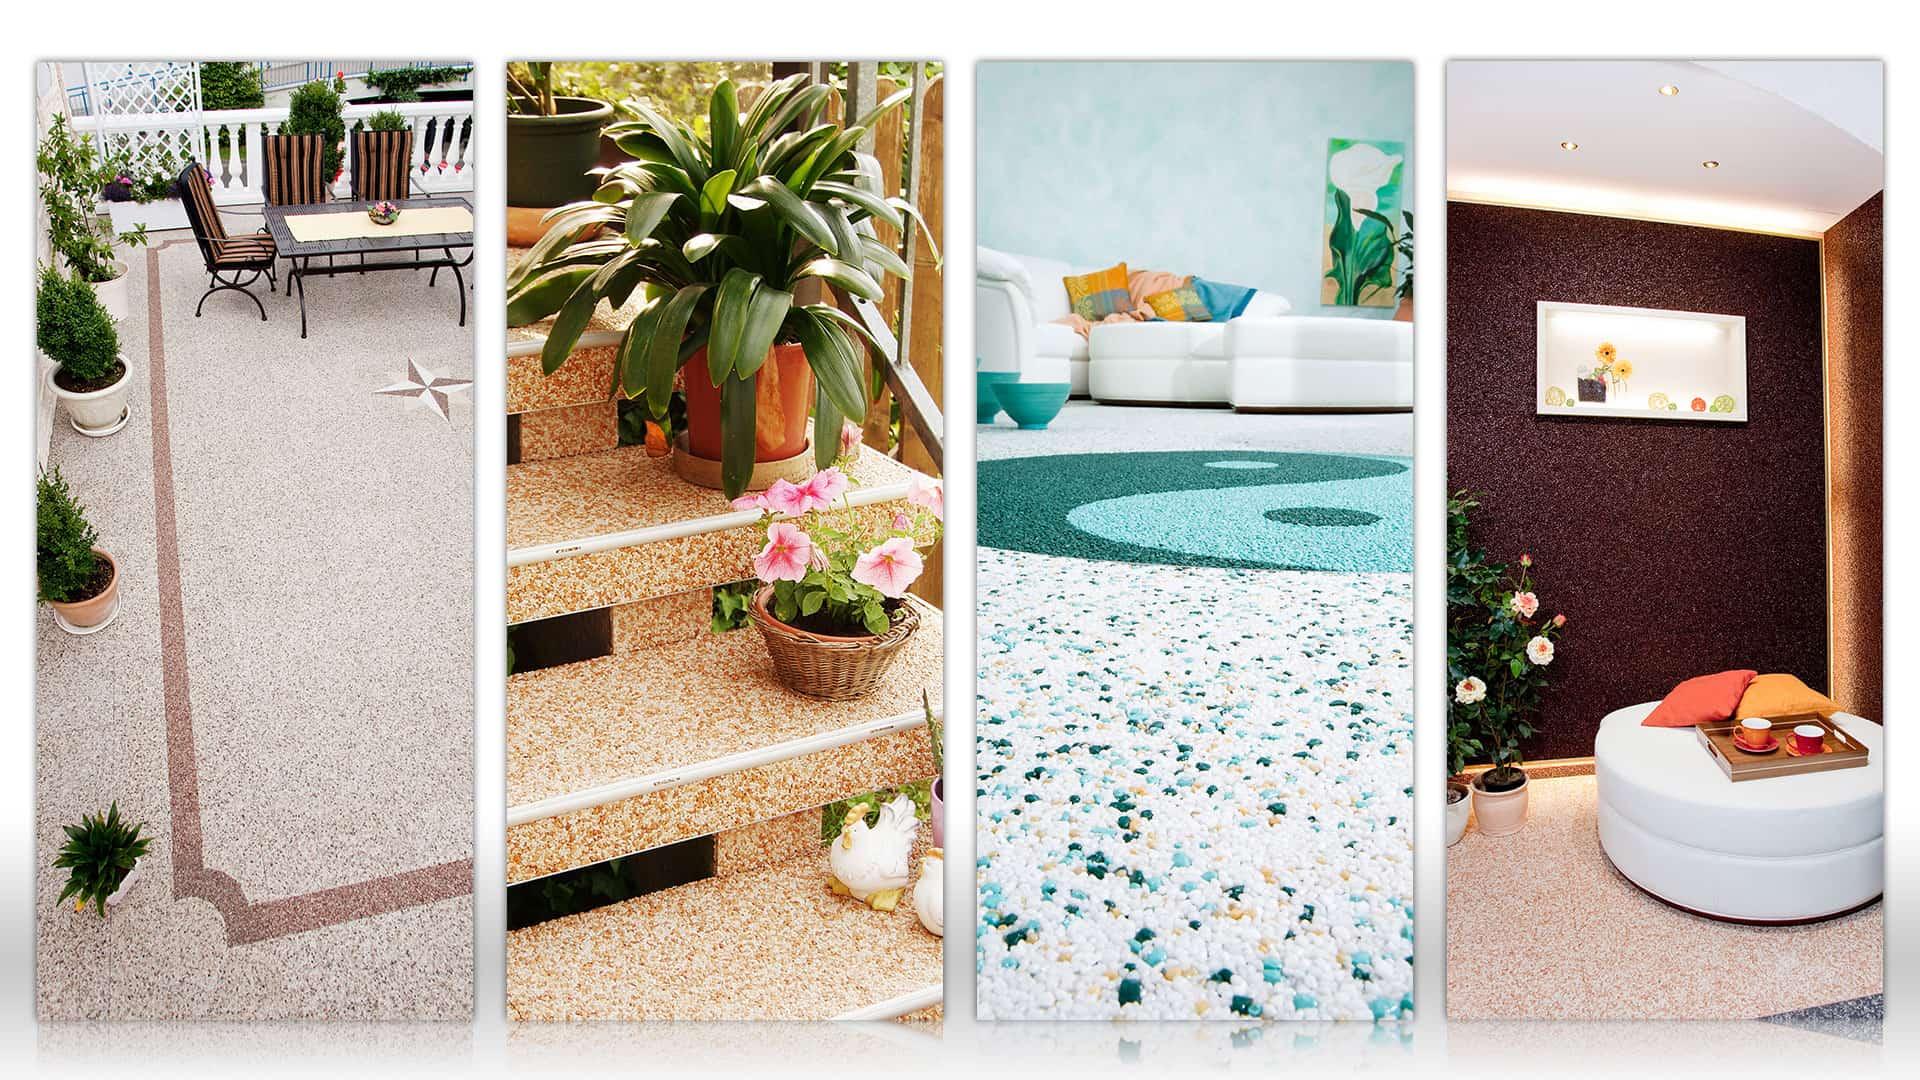 renofloor die nr 1 f r funktionalen steinteppich. Black Bedroom Furniture Sets. Home Design Ideas